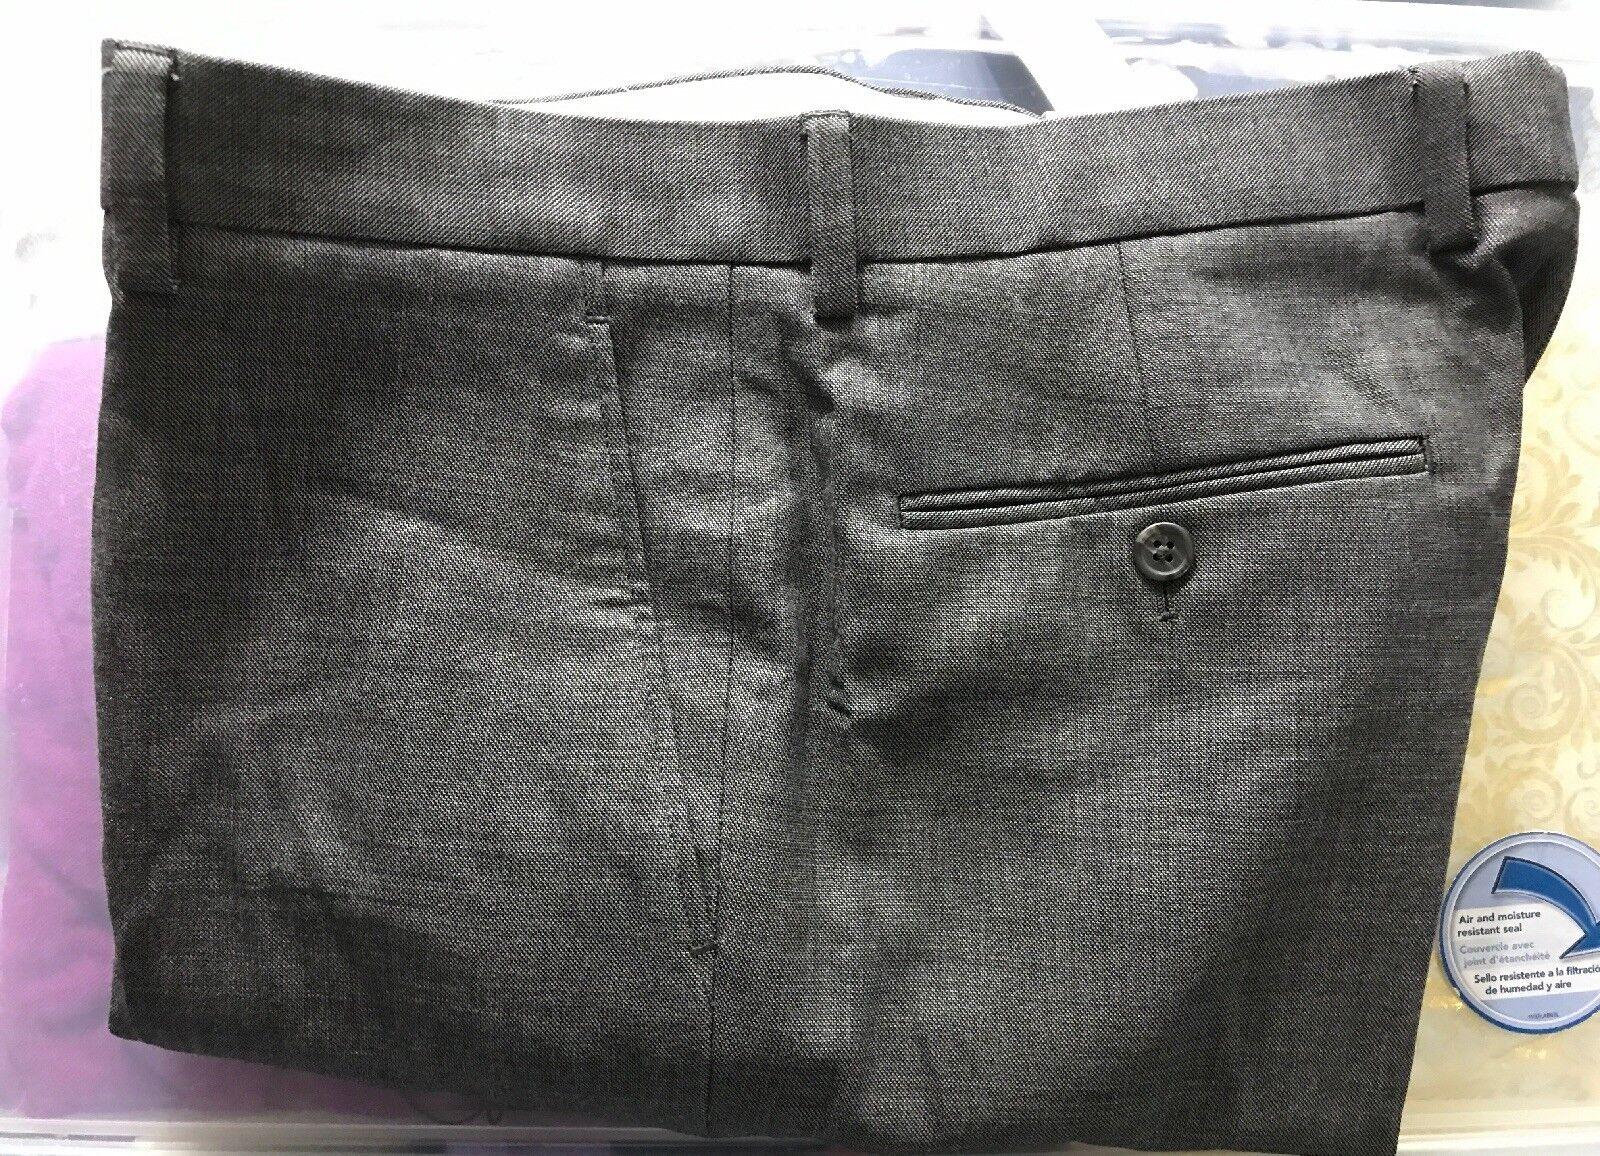 NWT J.crew Men's Bowery Classic Trousers Pants Wool 32X32